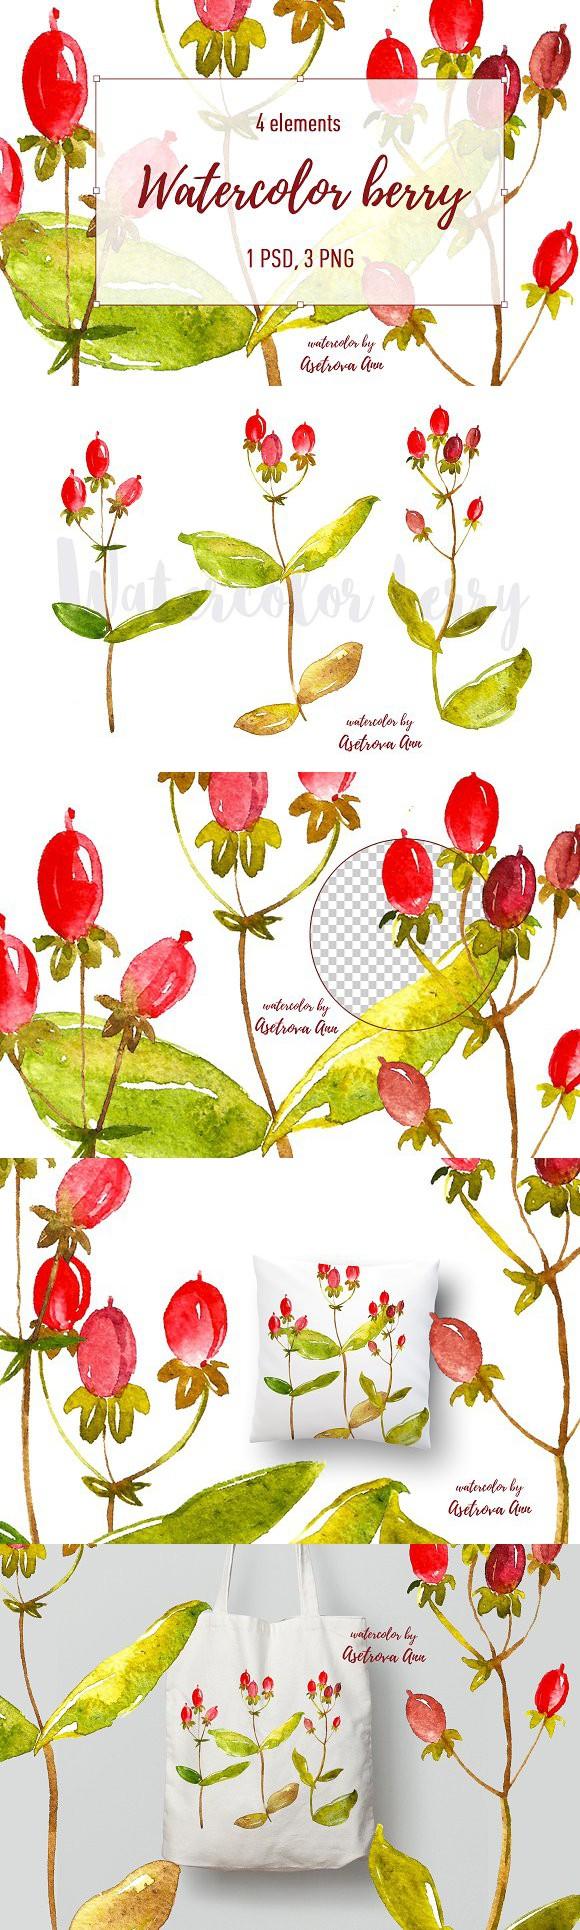 Watercolor berry photoshop textures photoshop textures pinterest